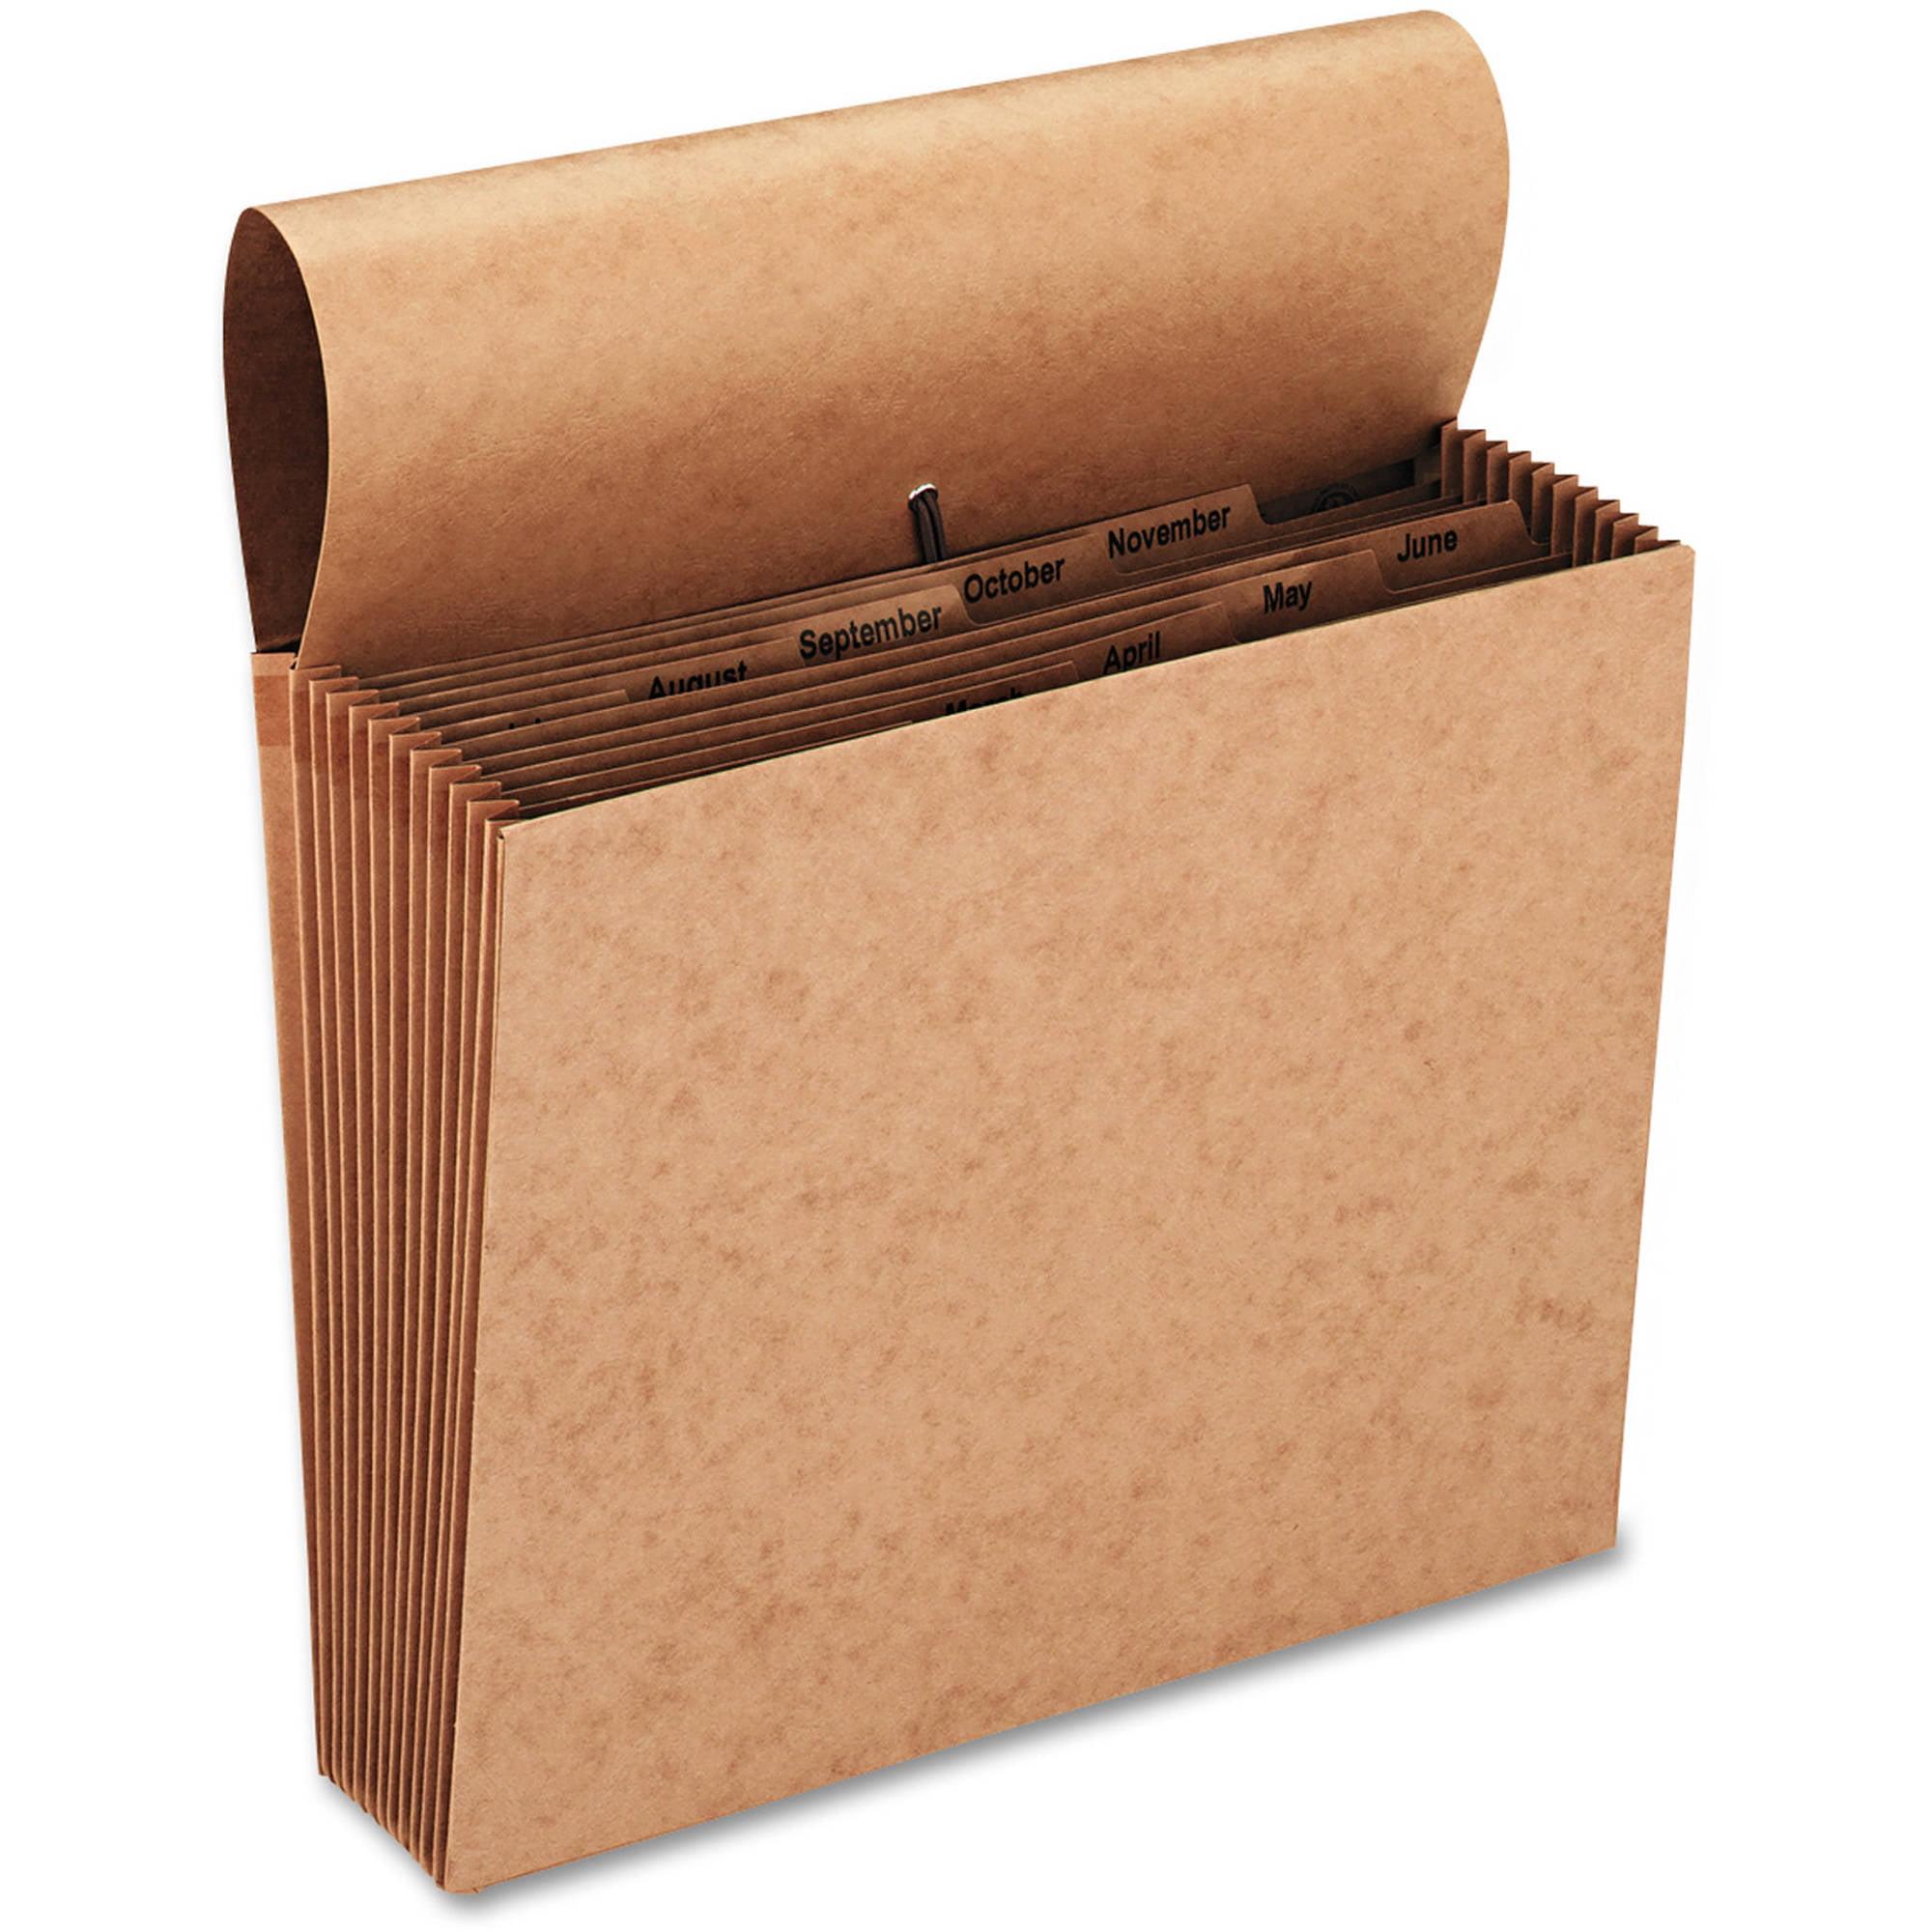 Smead Jan-Dec Indexed Expanding Files, 12 Pockets, Kraft, Letter, Brown